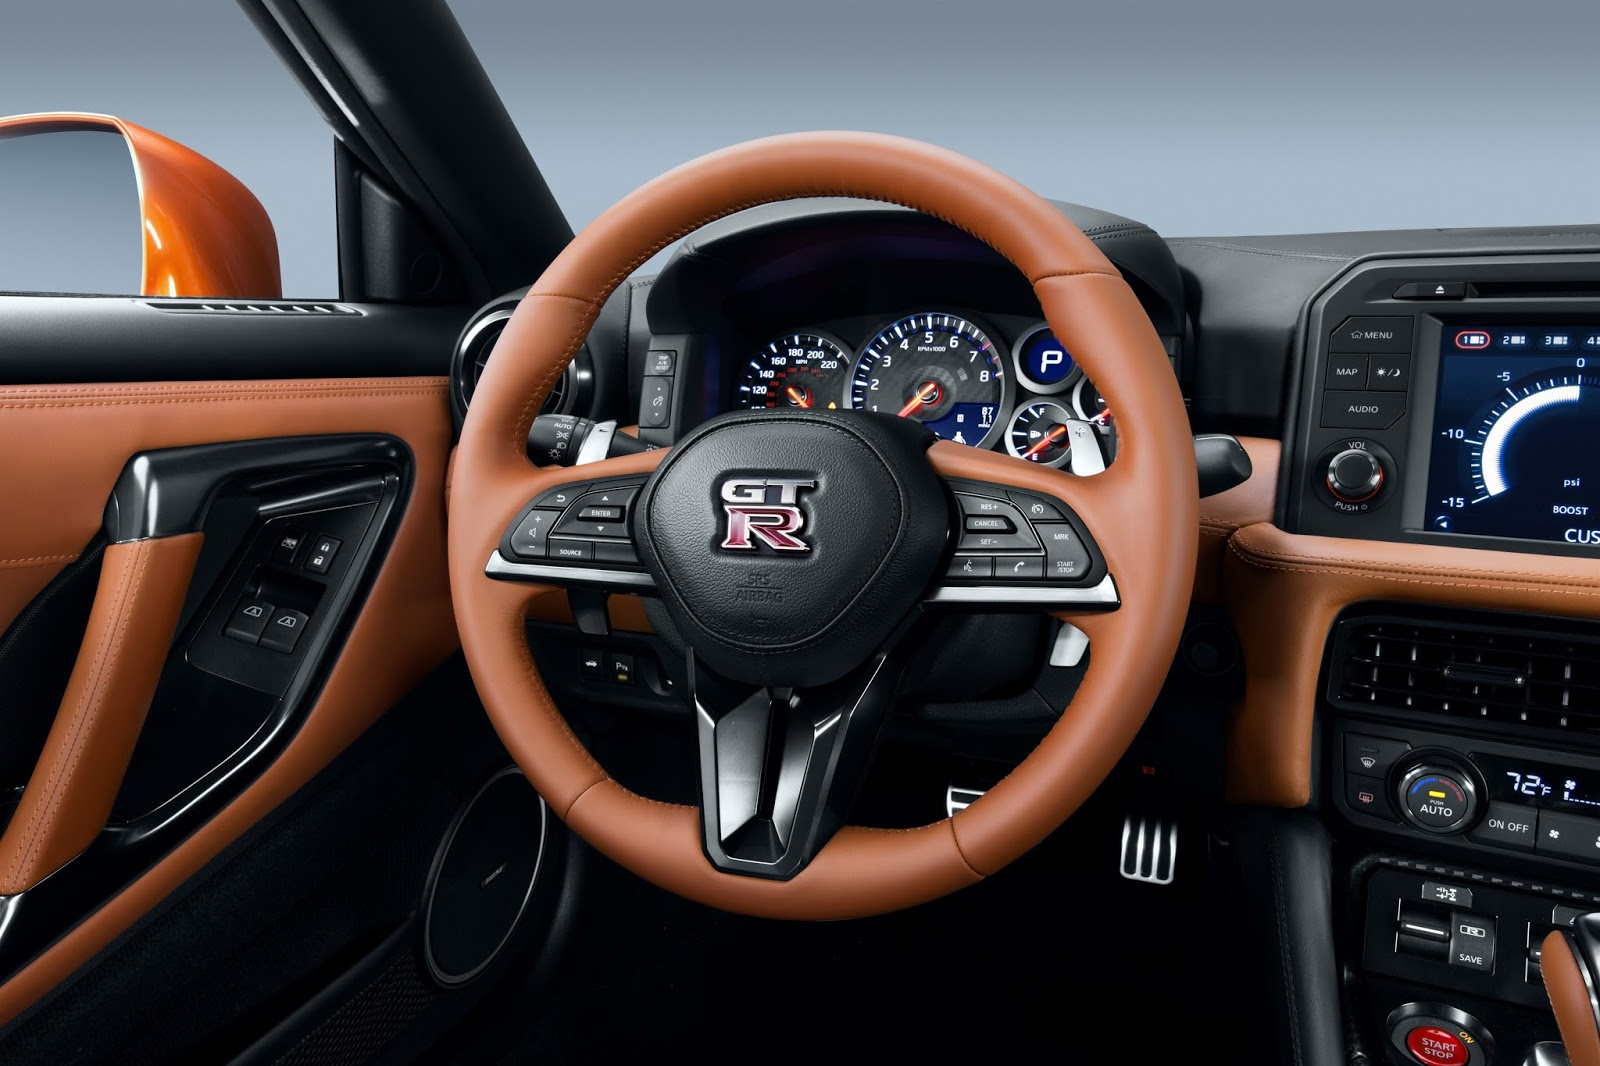 144060 1 5 Nissan GT-R: Ο Godzilla επέστρεψε! Godzilla, Nissan, Nissan GT-R, supercars, έκθεση Νέας Υόρκης